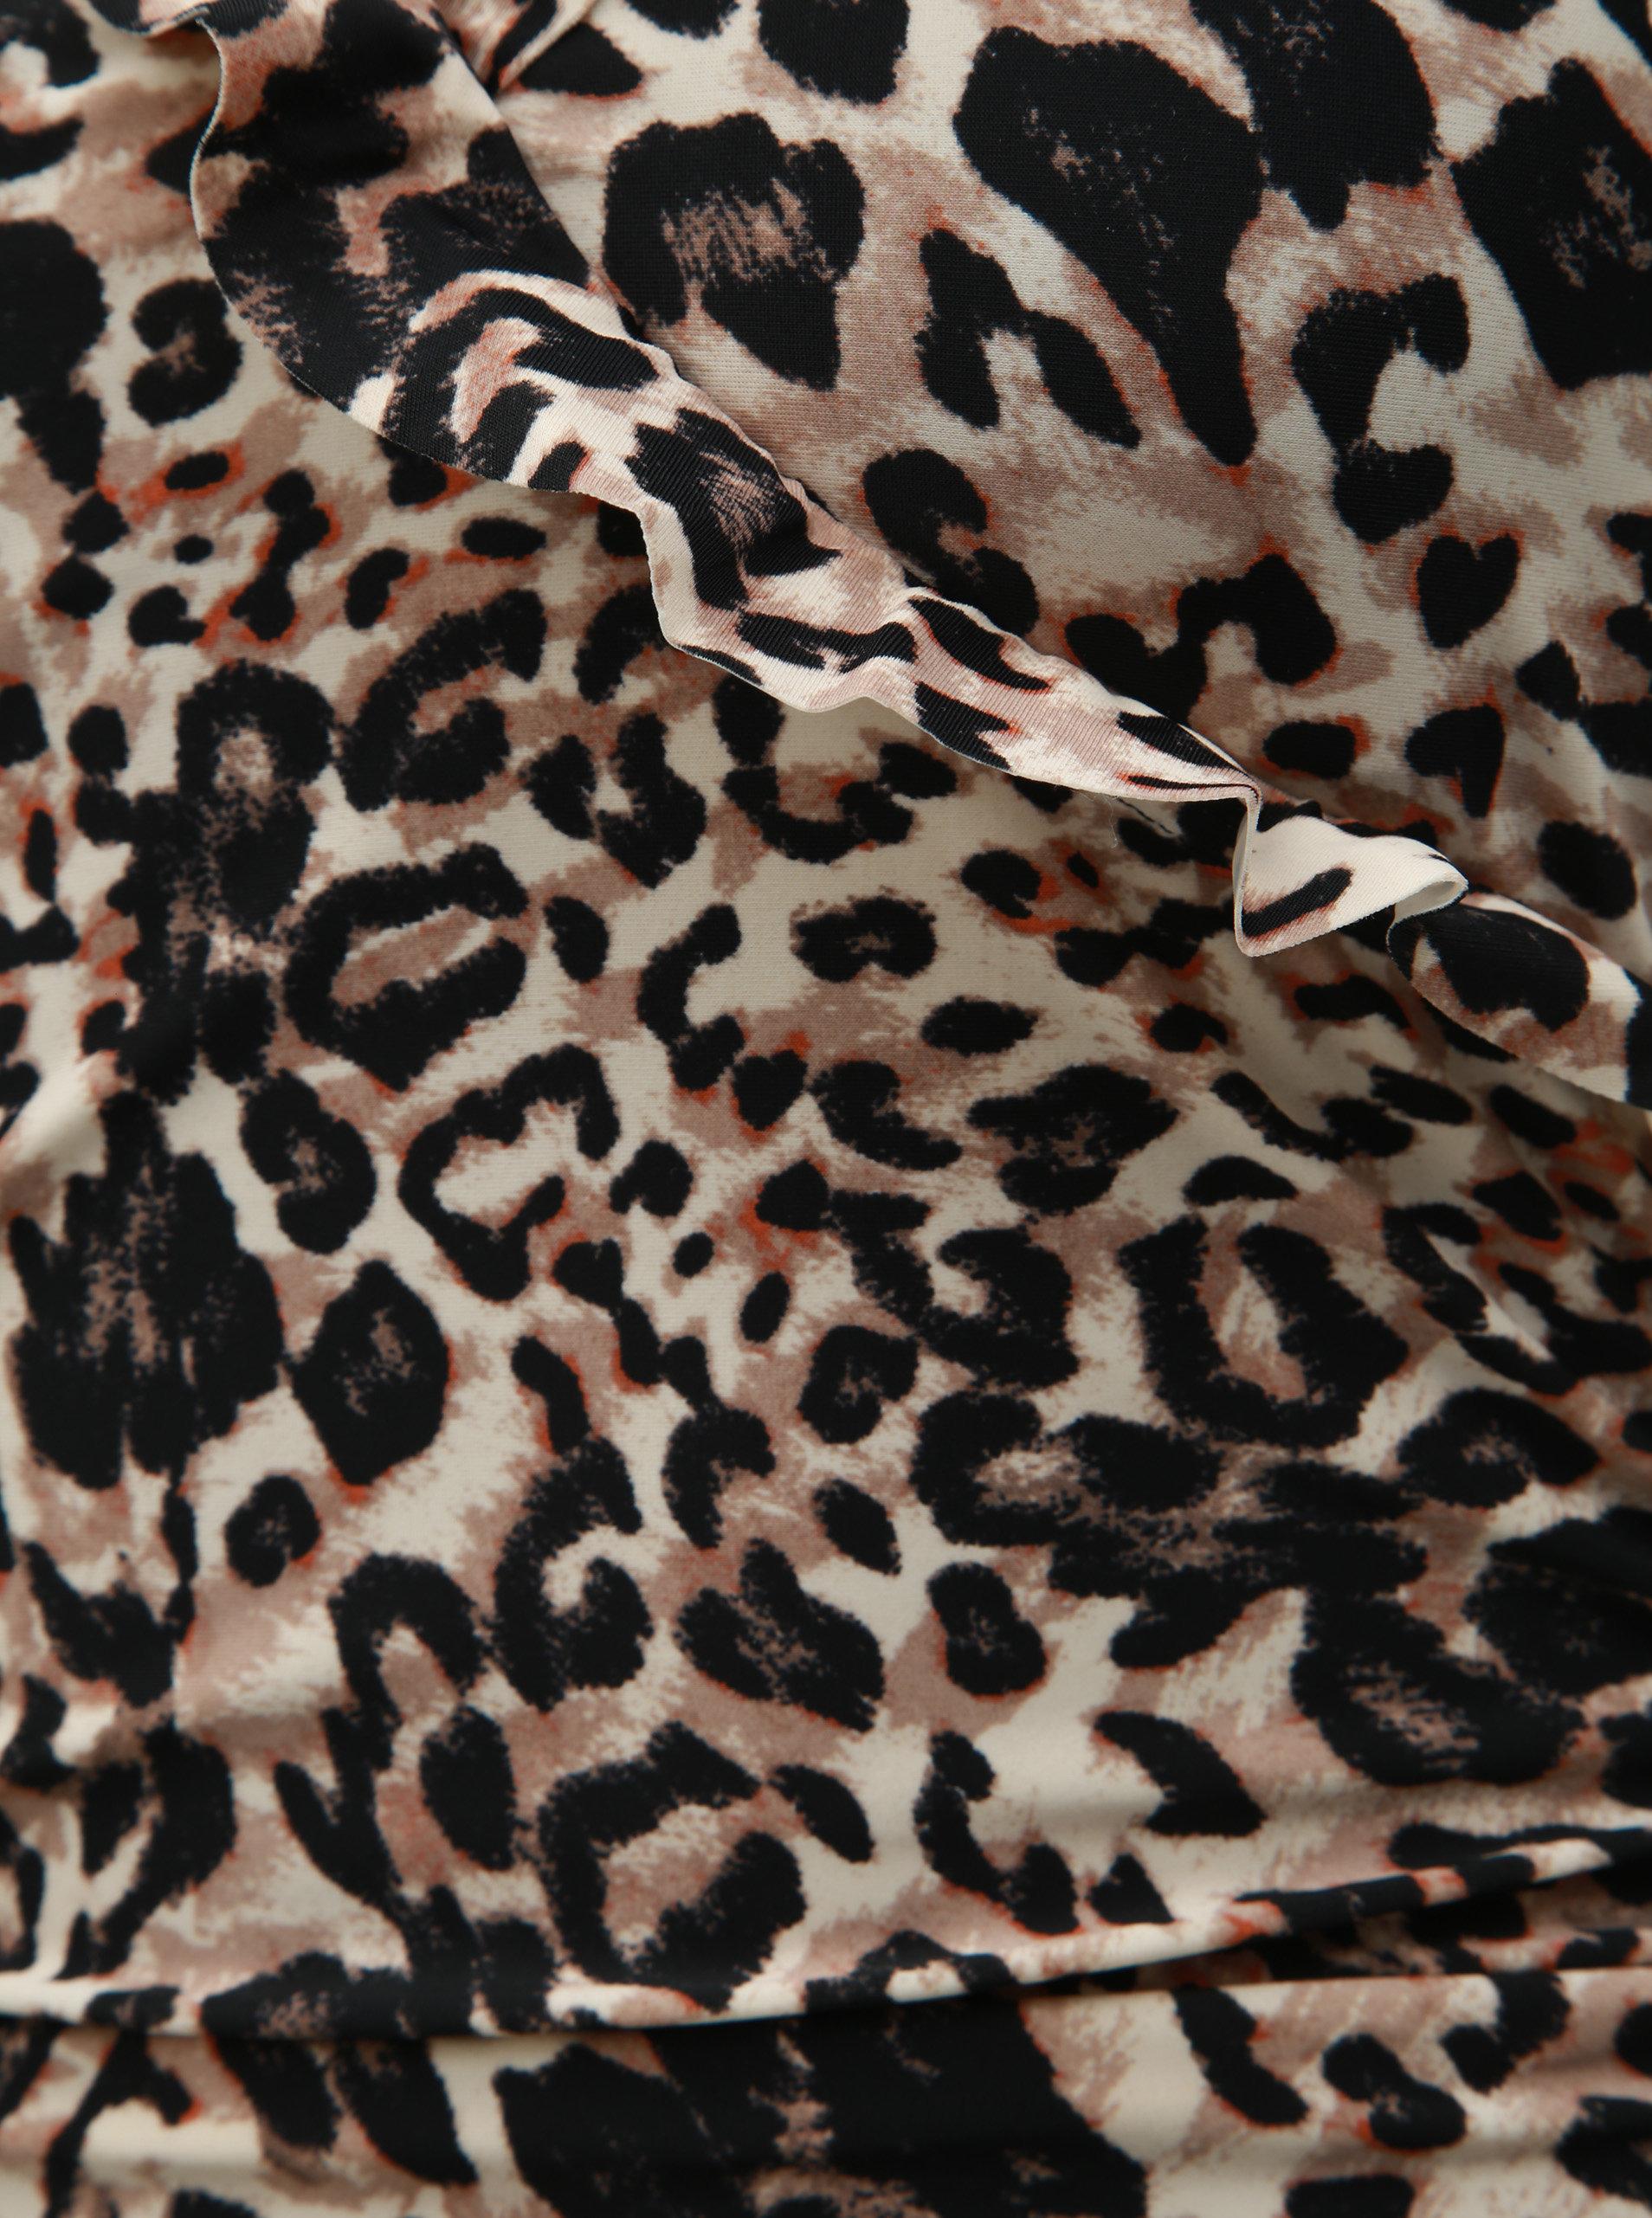 16aa2e7149c1 Hnedé jednodielne plavky s leopardím vzorom M Co ...